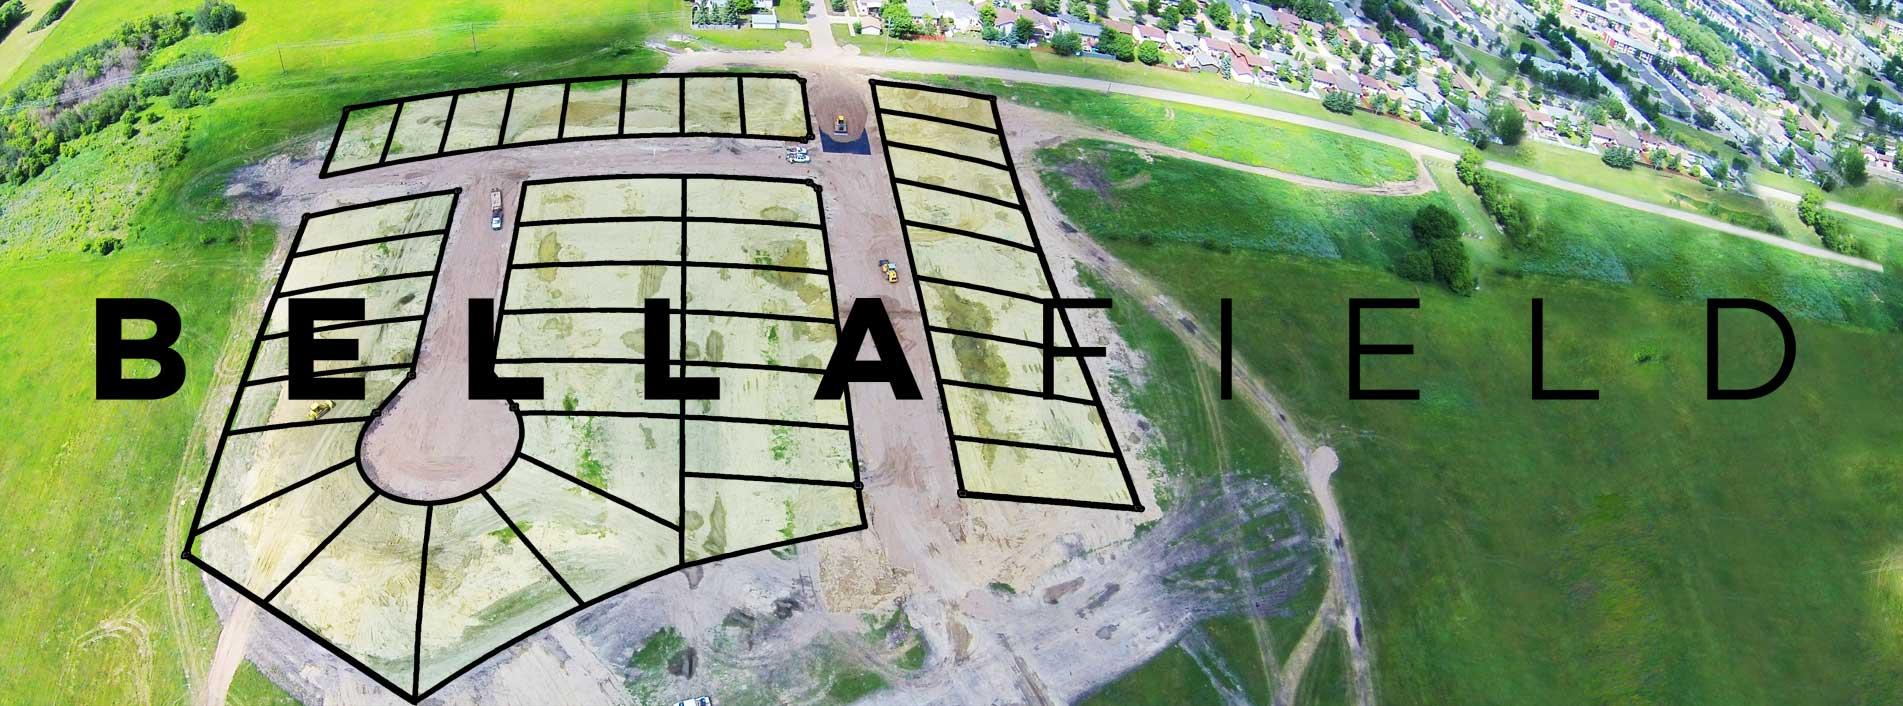 Communities, Bellafield Development, VBJ Developments, Brandon, Multi-family Homes